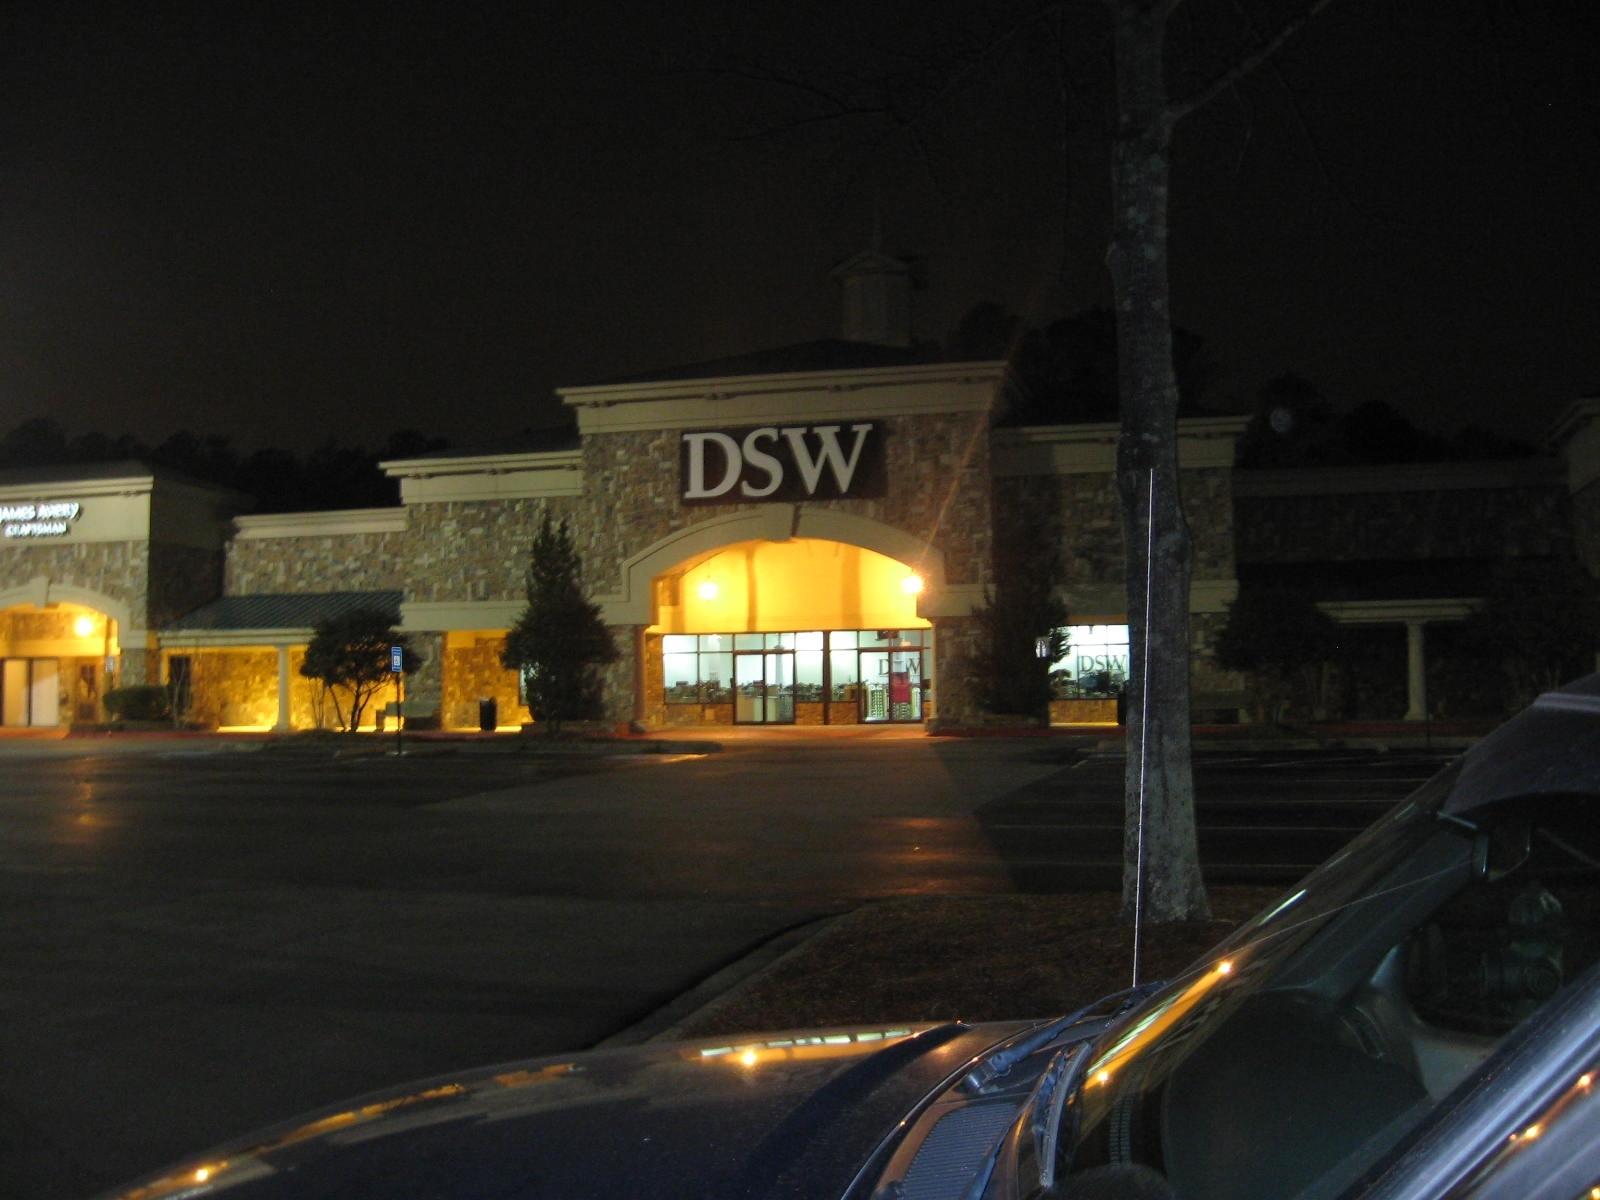 Dsw Designer Shoe Warehouse In Alpharetta Ga 770 998 7930